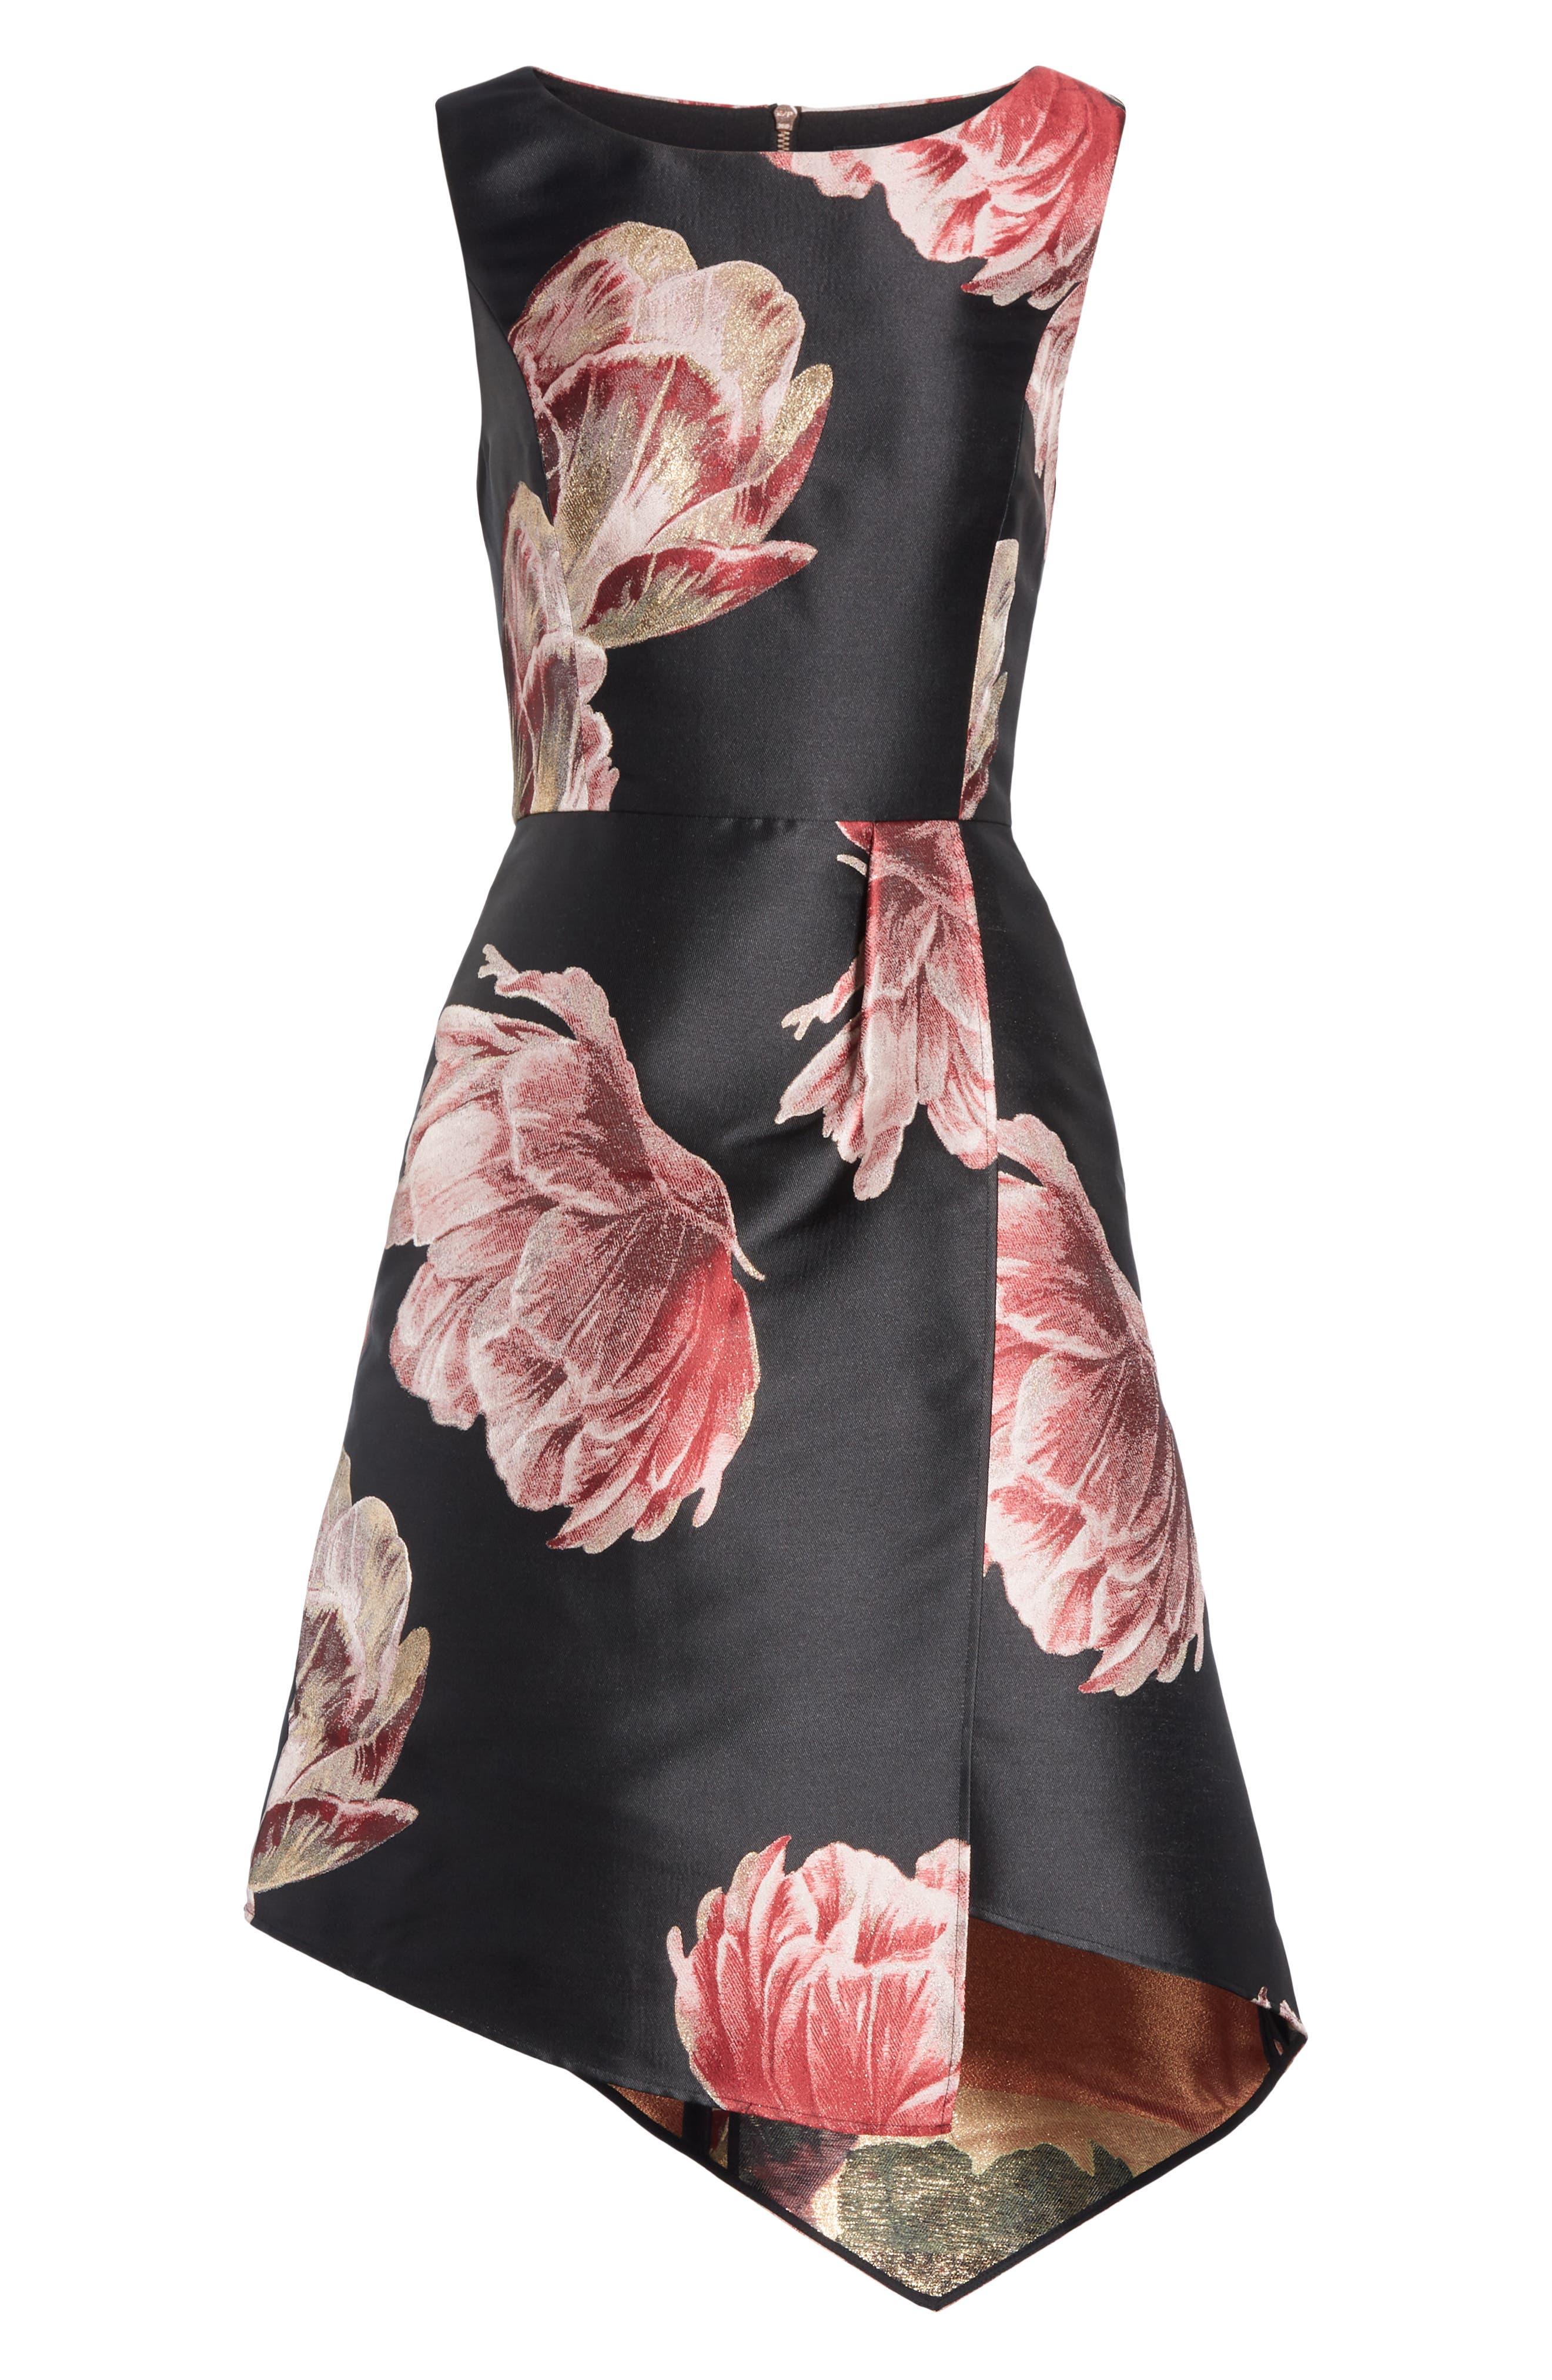 Eyvii Bay of Honour Asymmetrical Dress,                             Alternate thumbnail 7, color,                             001